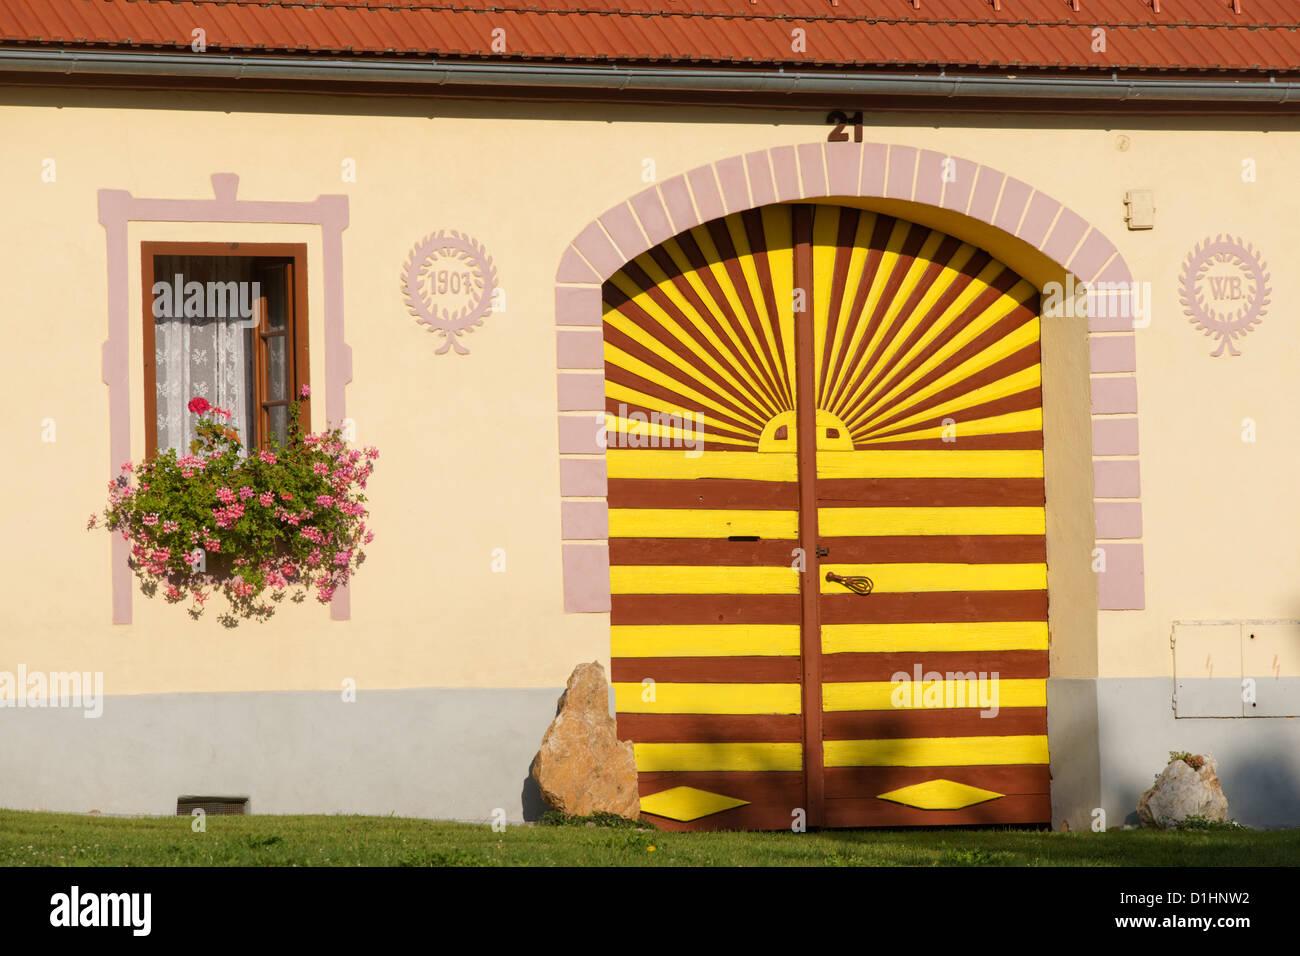 Farmstead gate in Holasovice, South Bohemia, Czech Republic - Stock Image